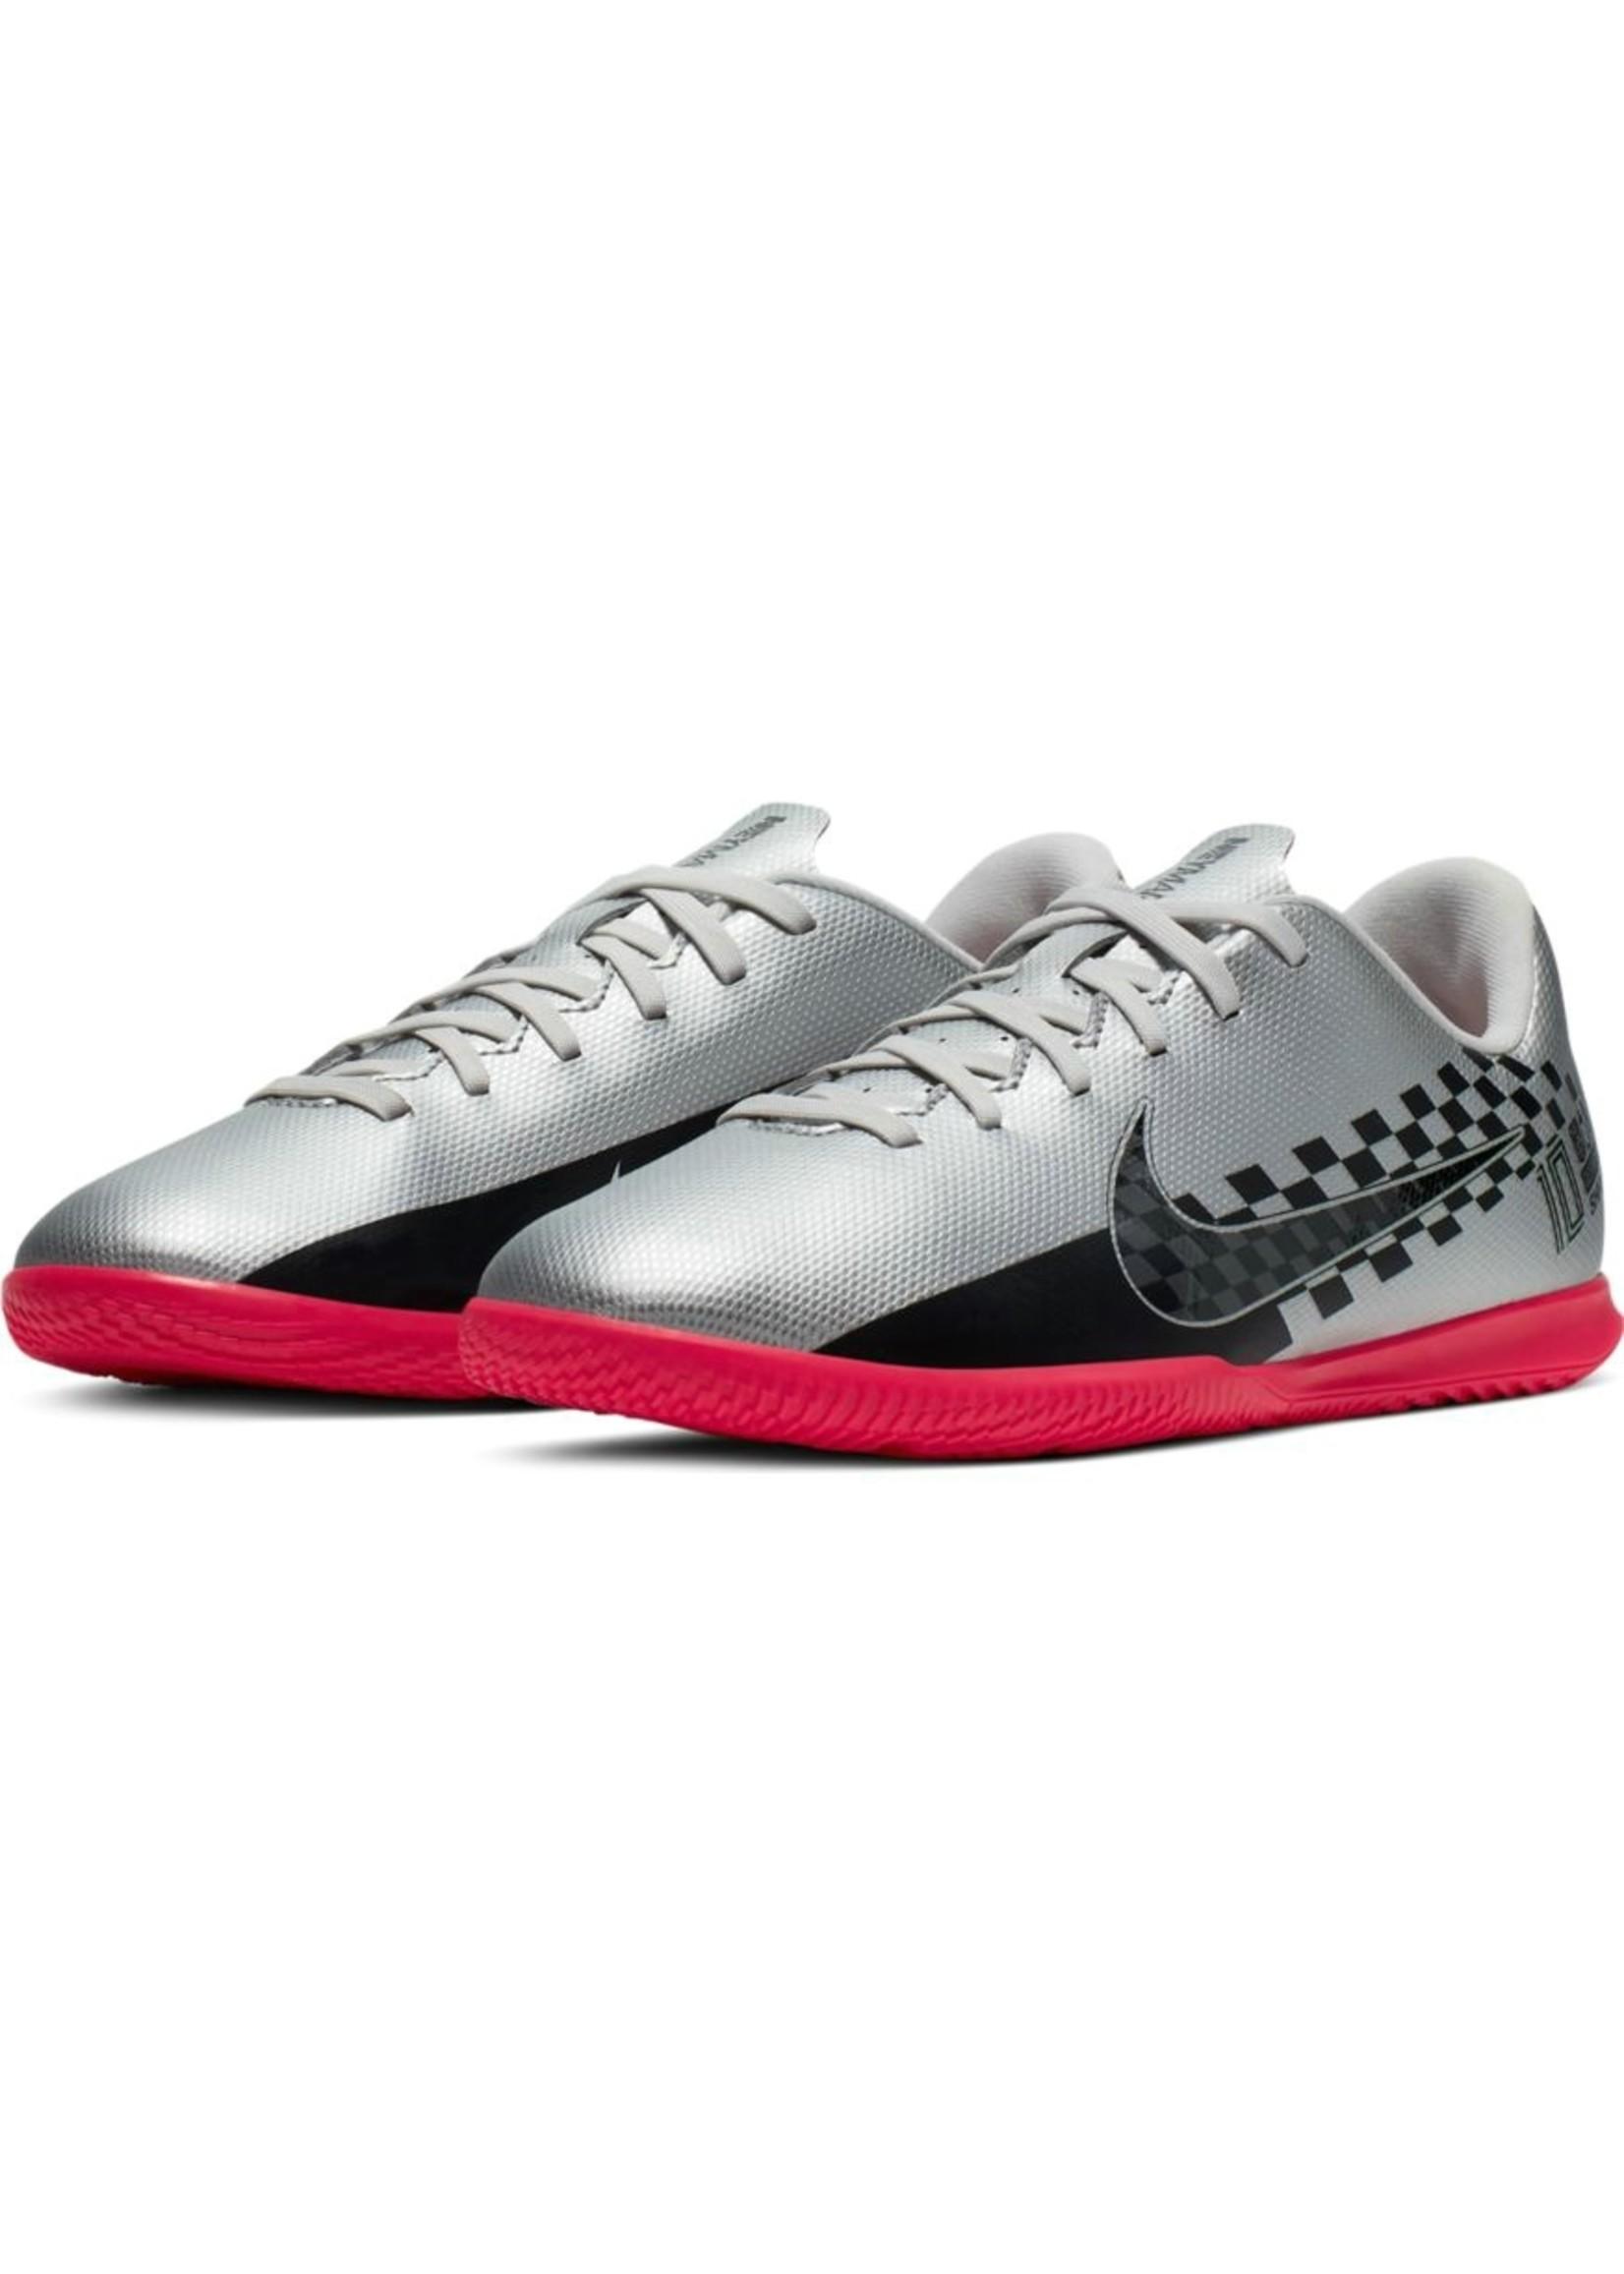 Nike JR VAPOR 13 CLUB NJR IC